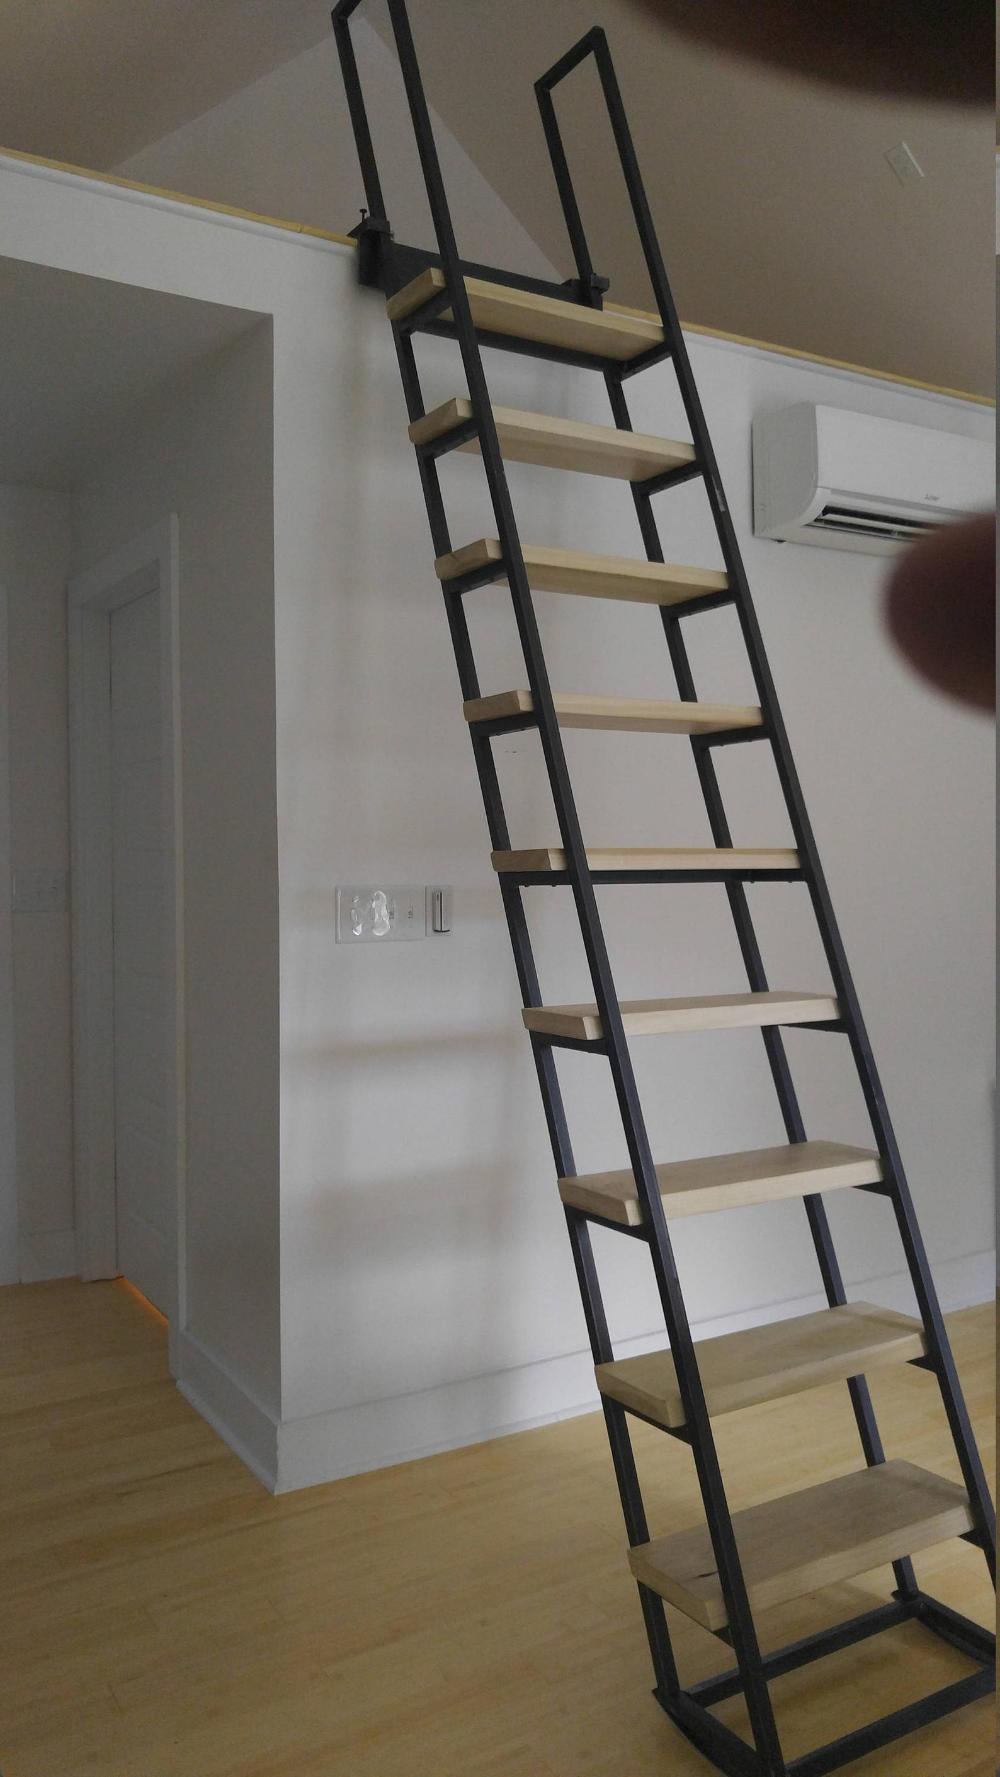 Making Stairs Is Among The Various For The Most Part Extraordinary Monotonous Setting Up Commitments V 2020 G Lestnichnye Konstrukcii Lestnica Na Cherdak Skrytye Komnaty